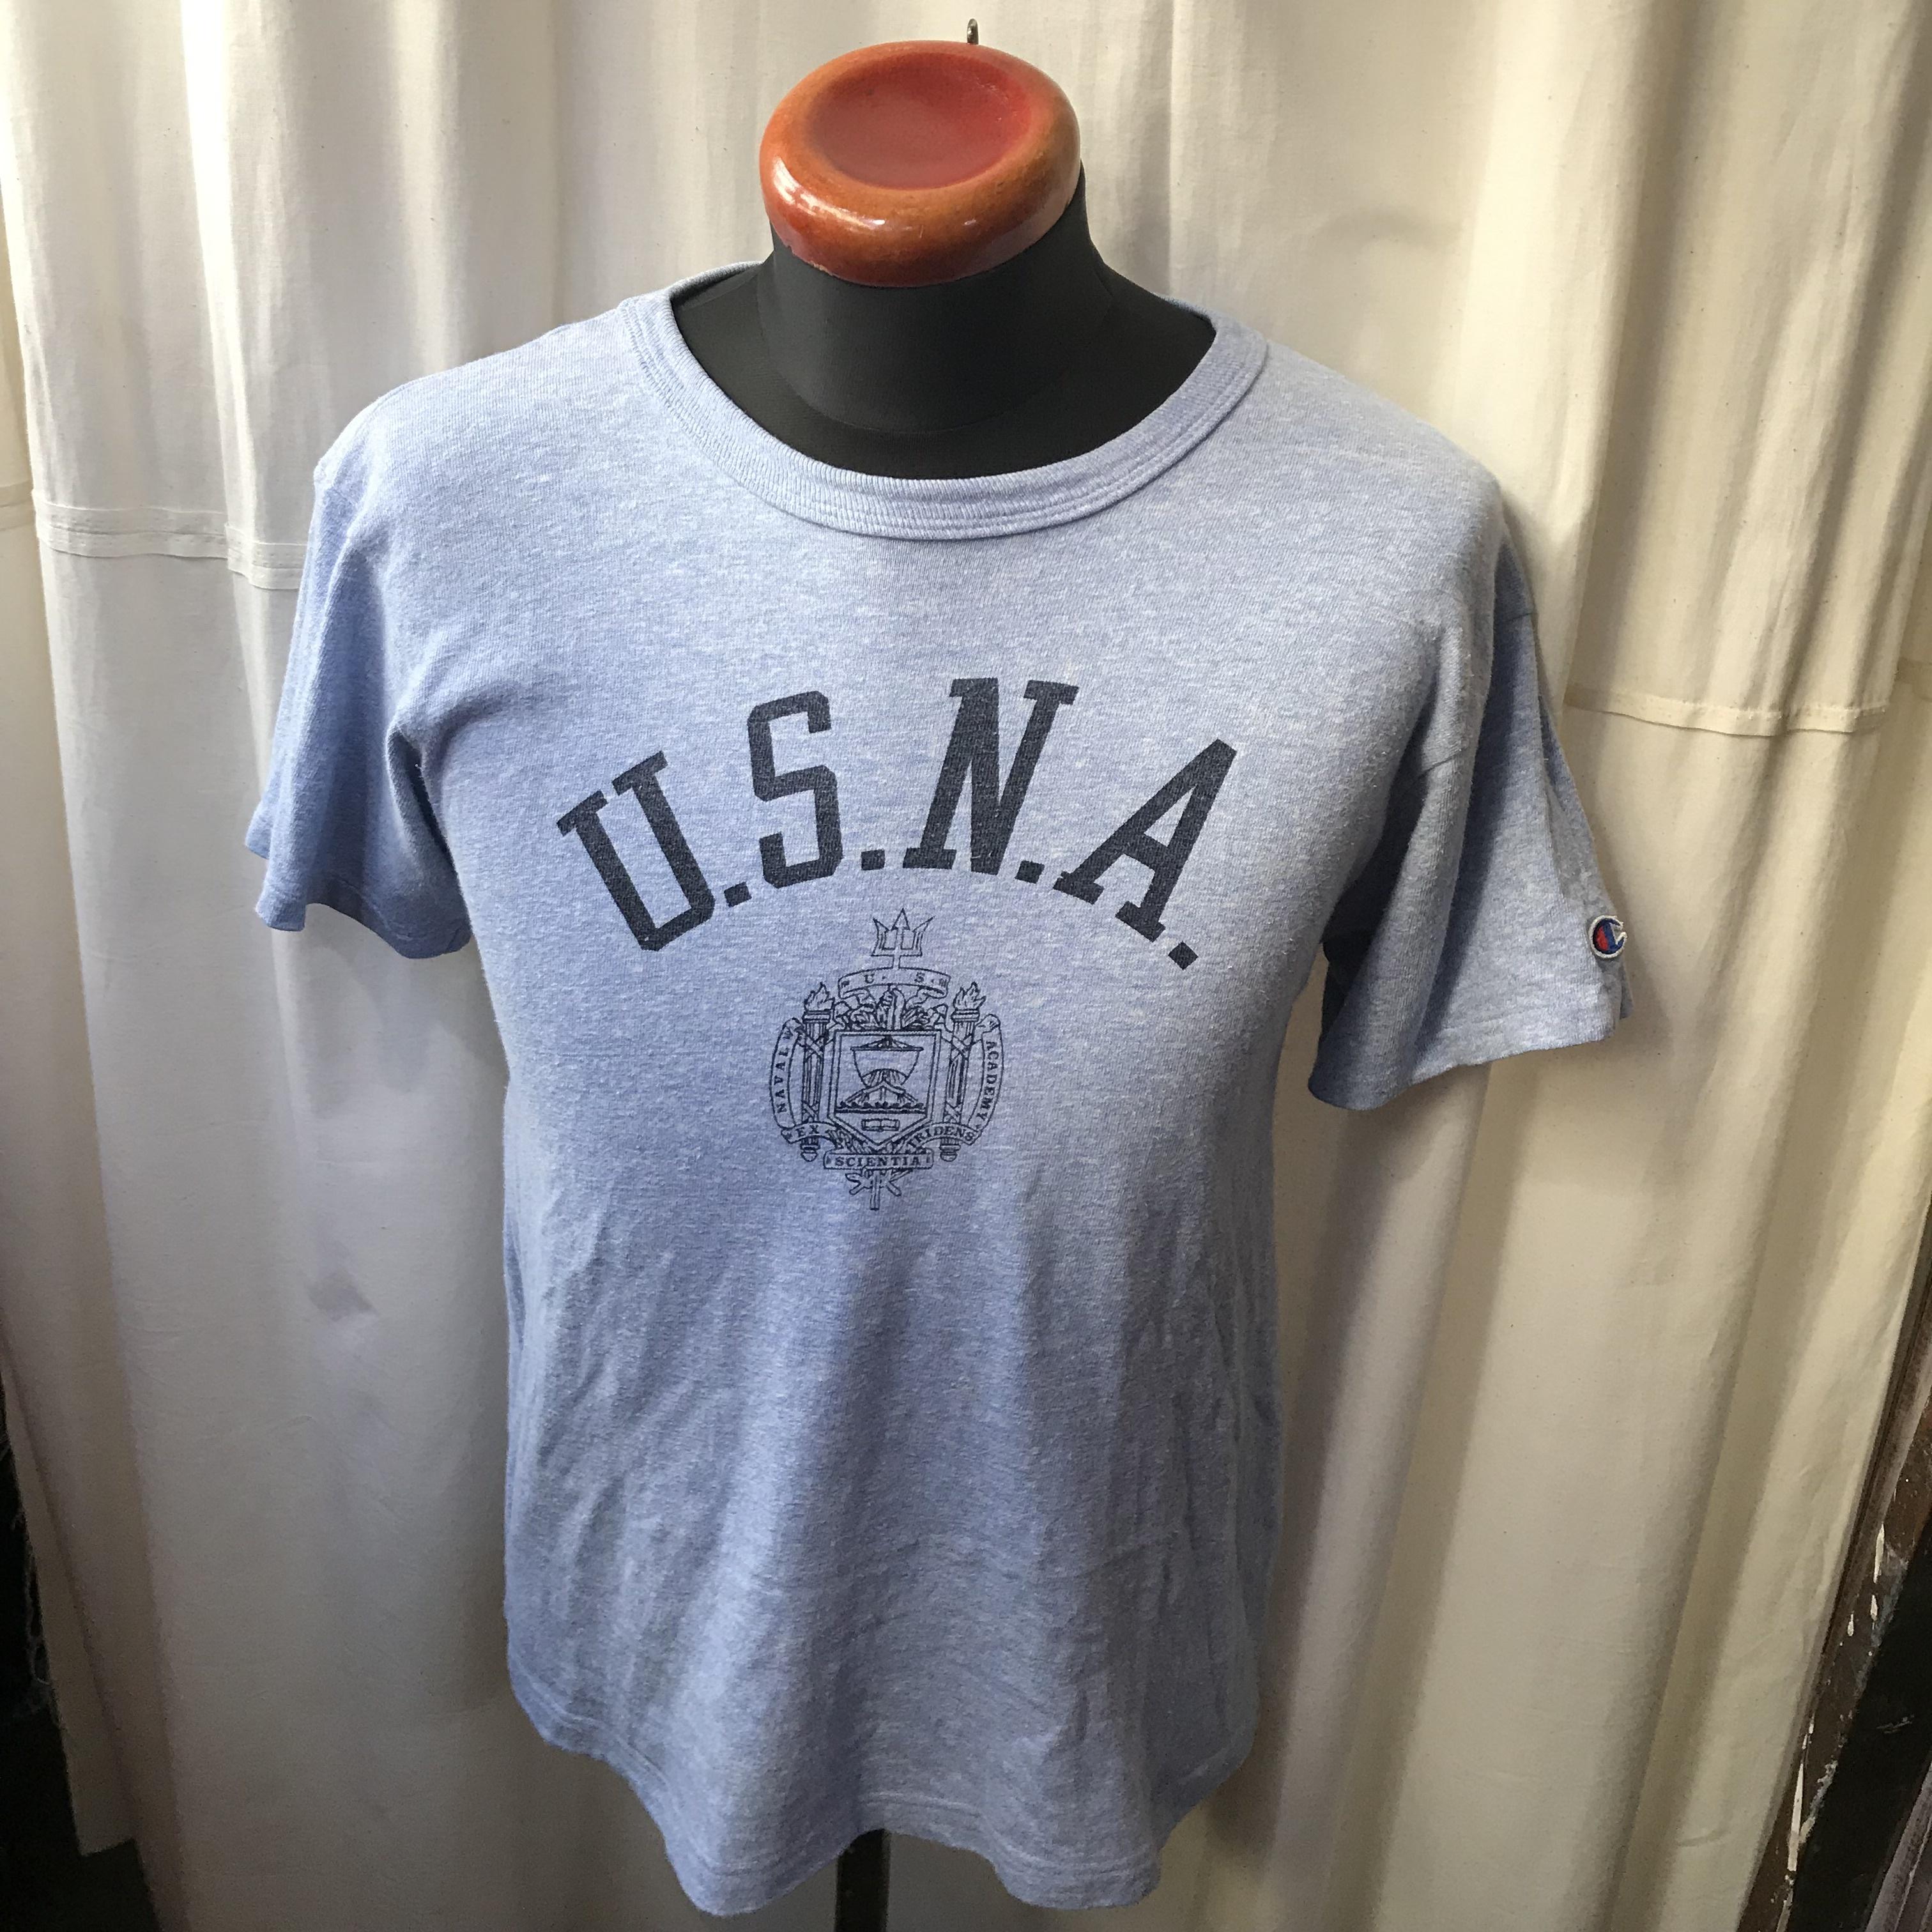 80's old champion U.S.N.A チャンピオン アメリカ海軍兵学校 8812 染み込みプリント杢半袖Tシャツ メンズM